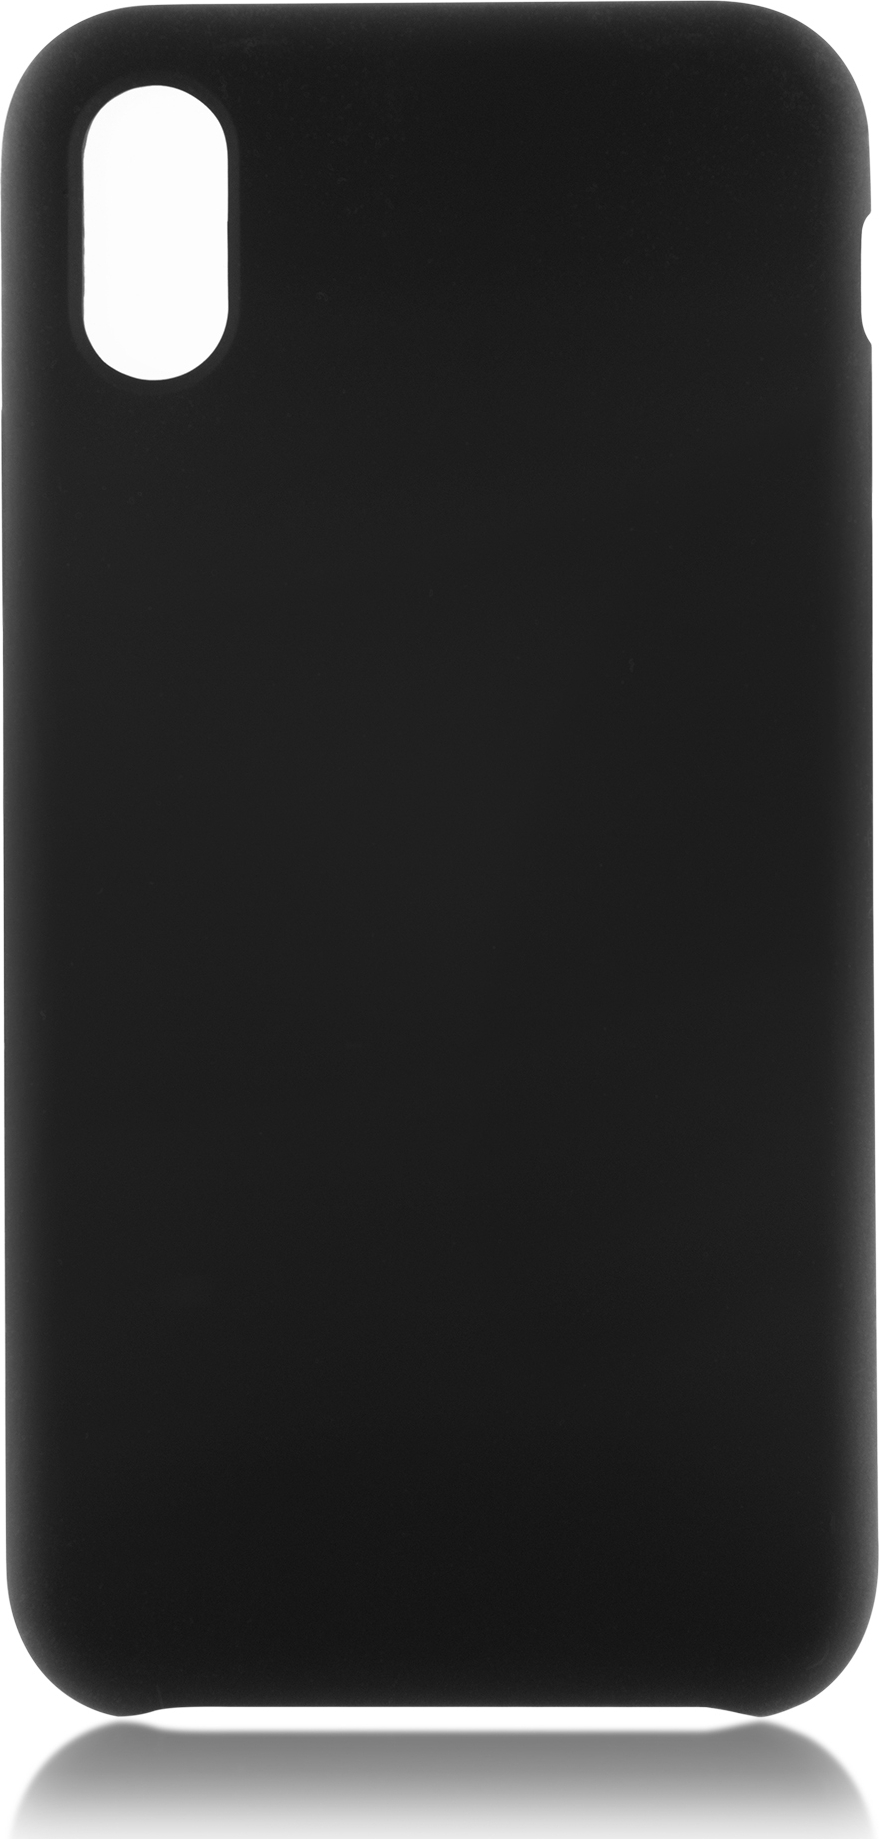 Чехол Brosco Softrubber для Apple iPhone X, черный аксессуар чехол для apple iphone 6 brosco soft rubber black ip6 softrubber black